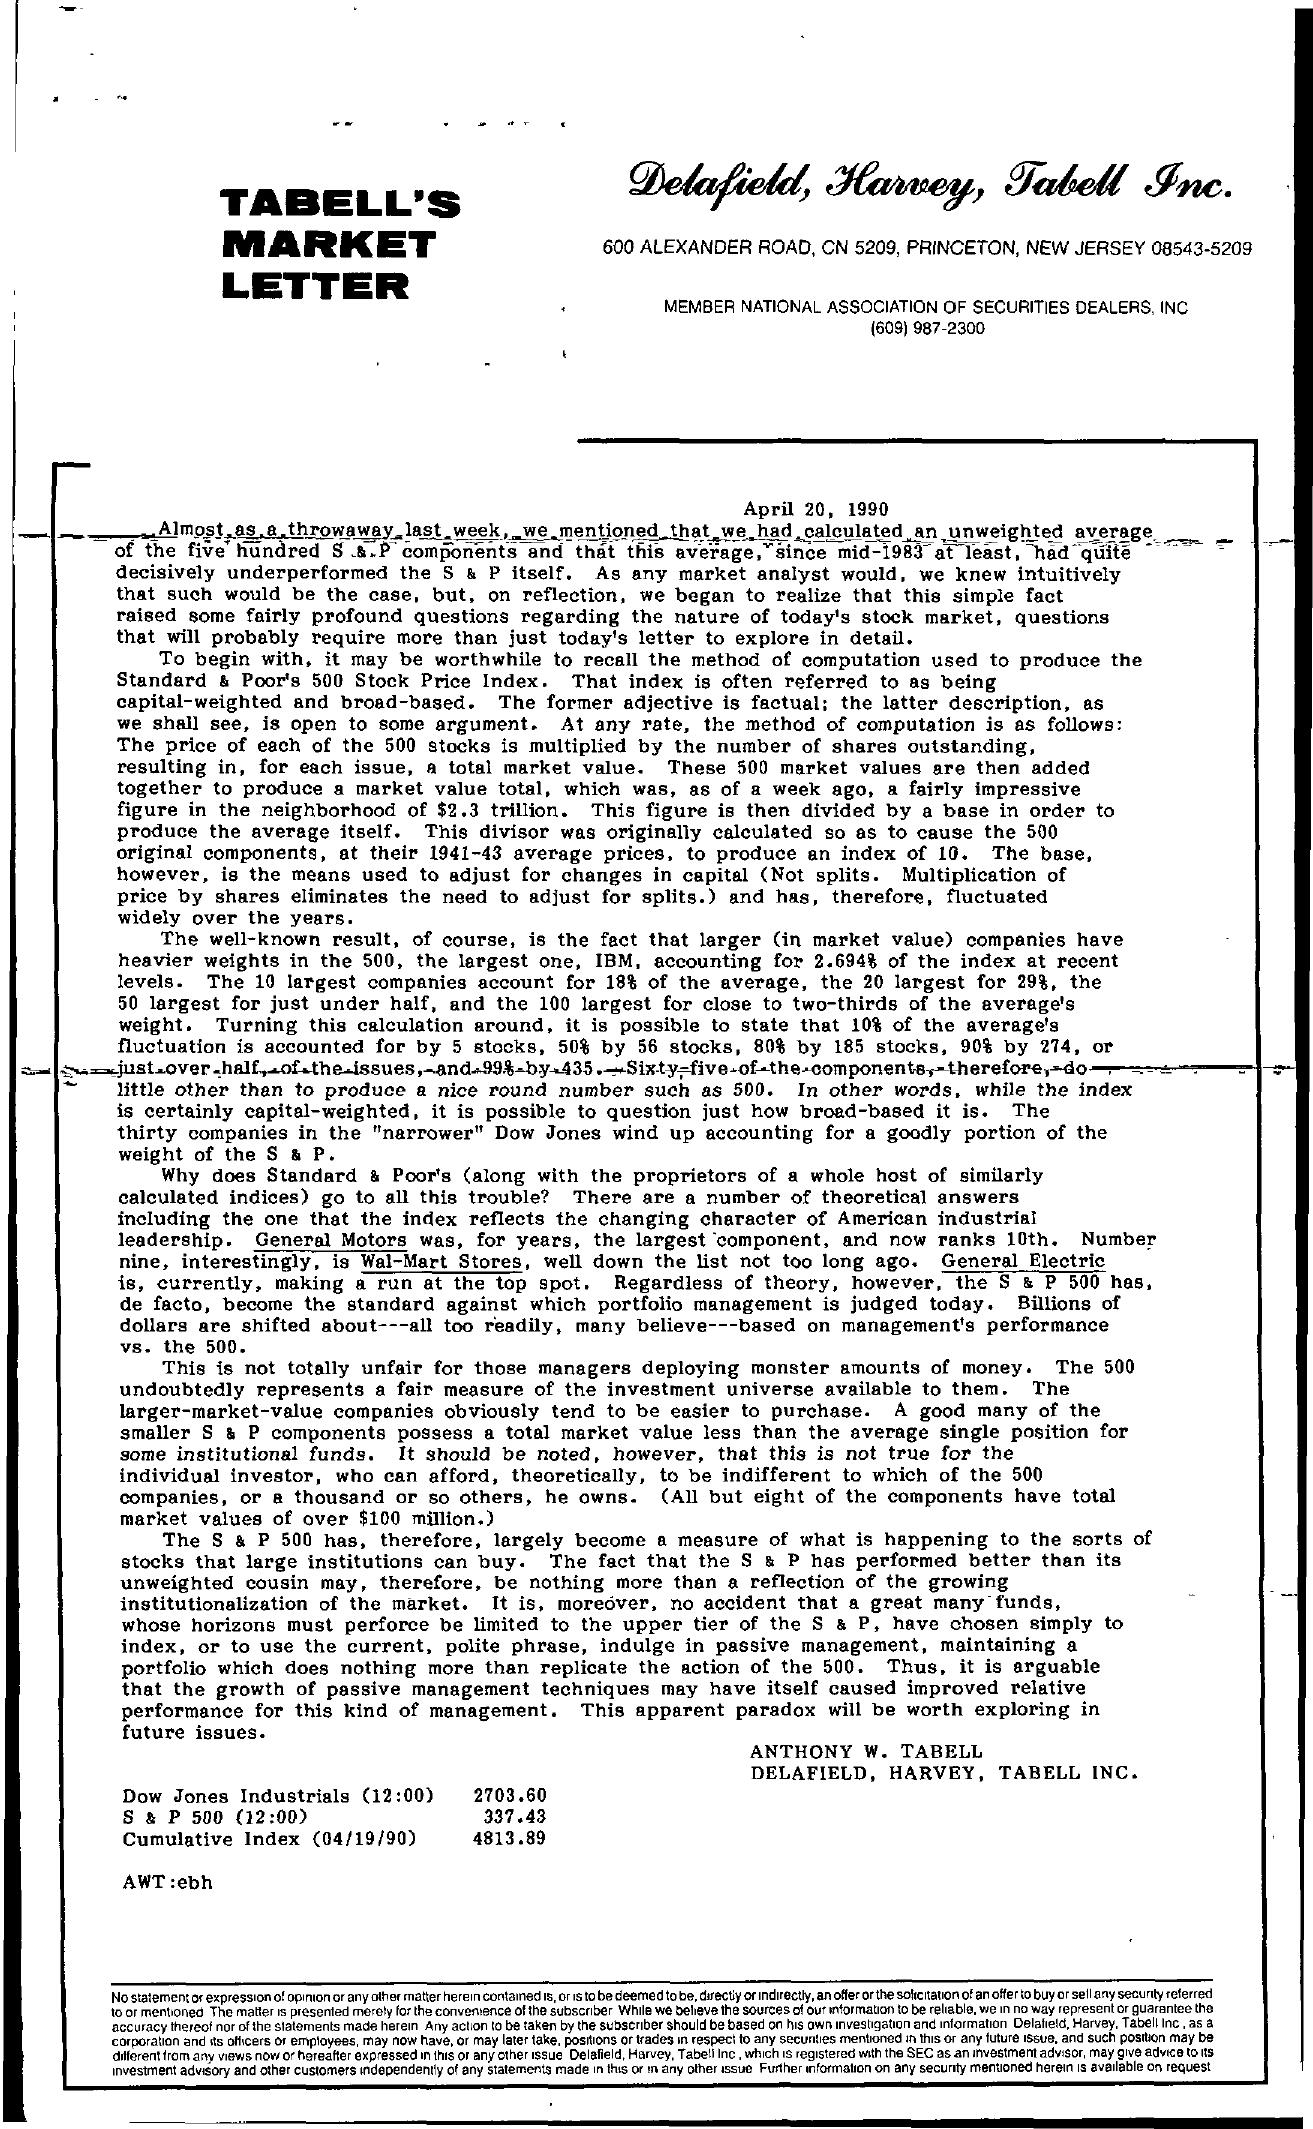 Tabell's Market Letter - April 20, 1990